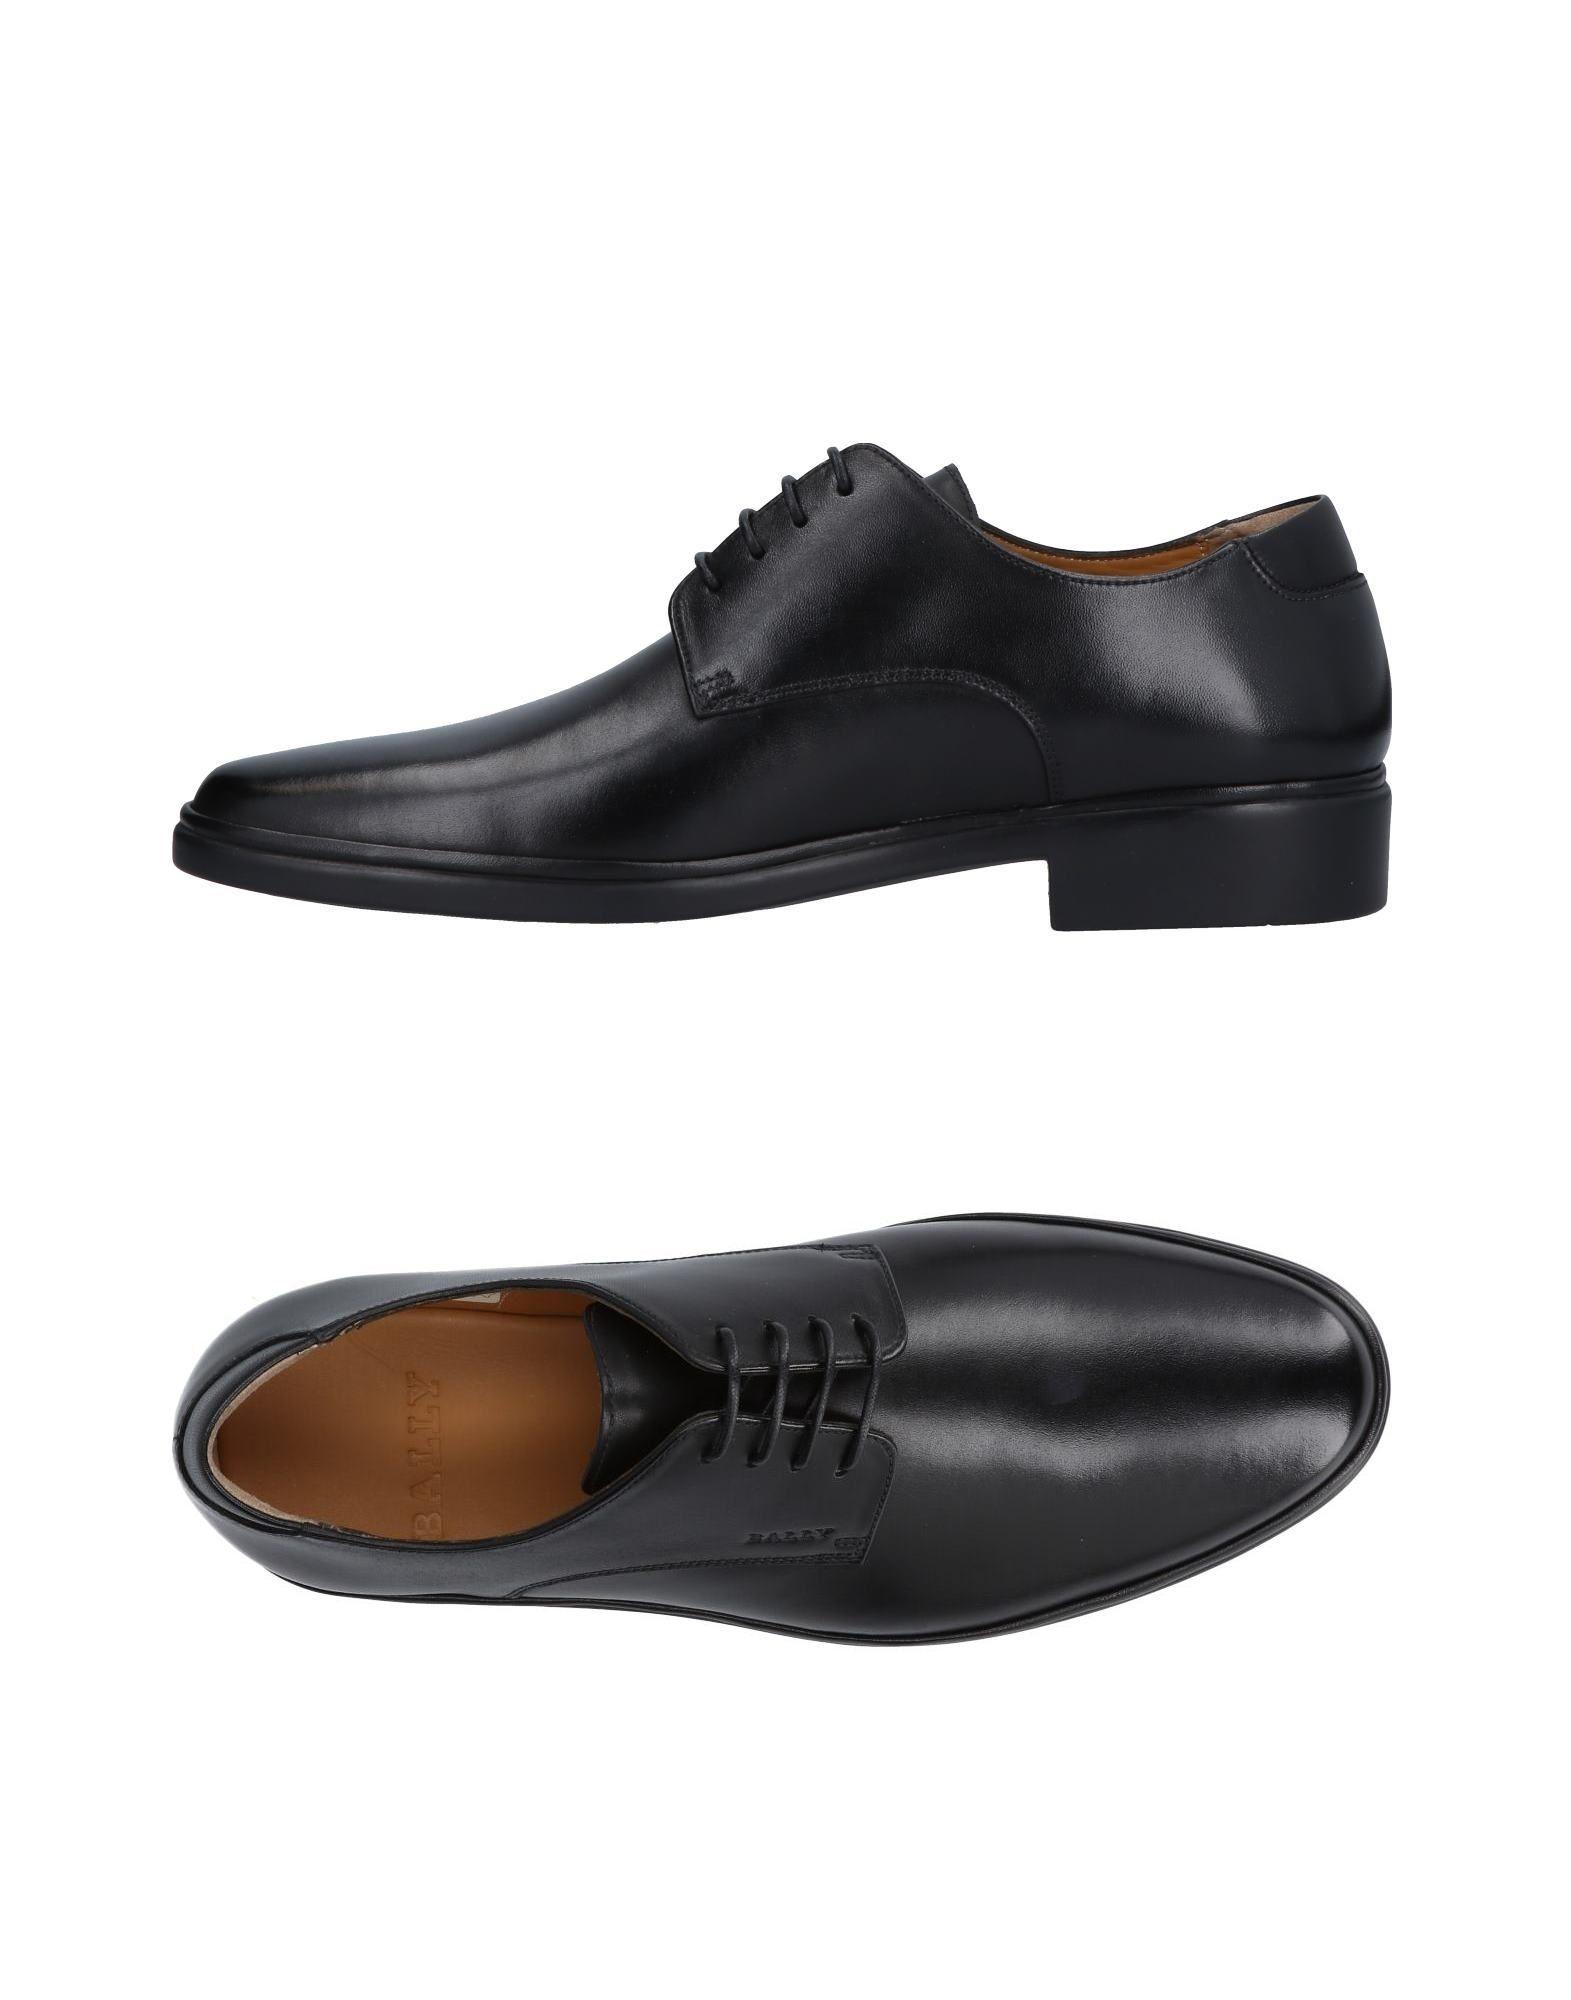 Фото - BALLY Обувь на шнурках обувь на высокой платформе dkny